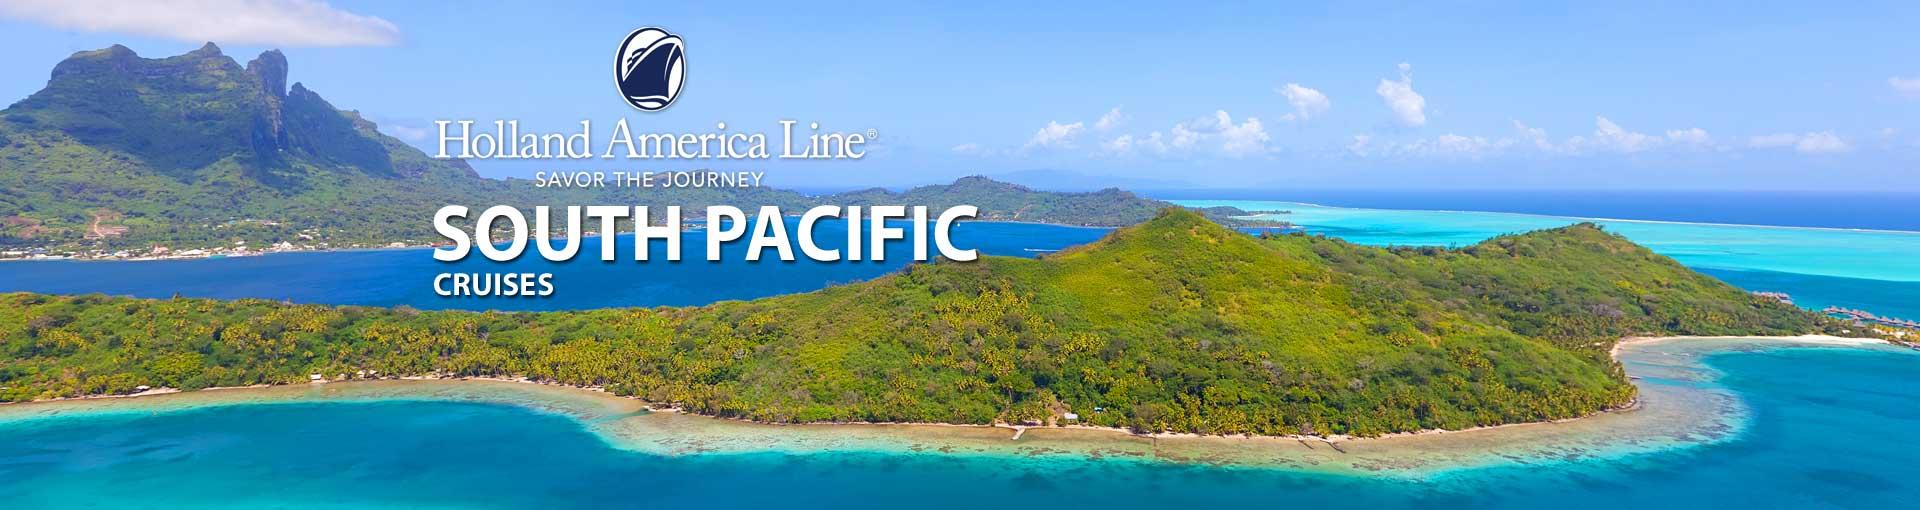 Holland America South Pacific Tahiti Cruises